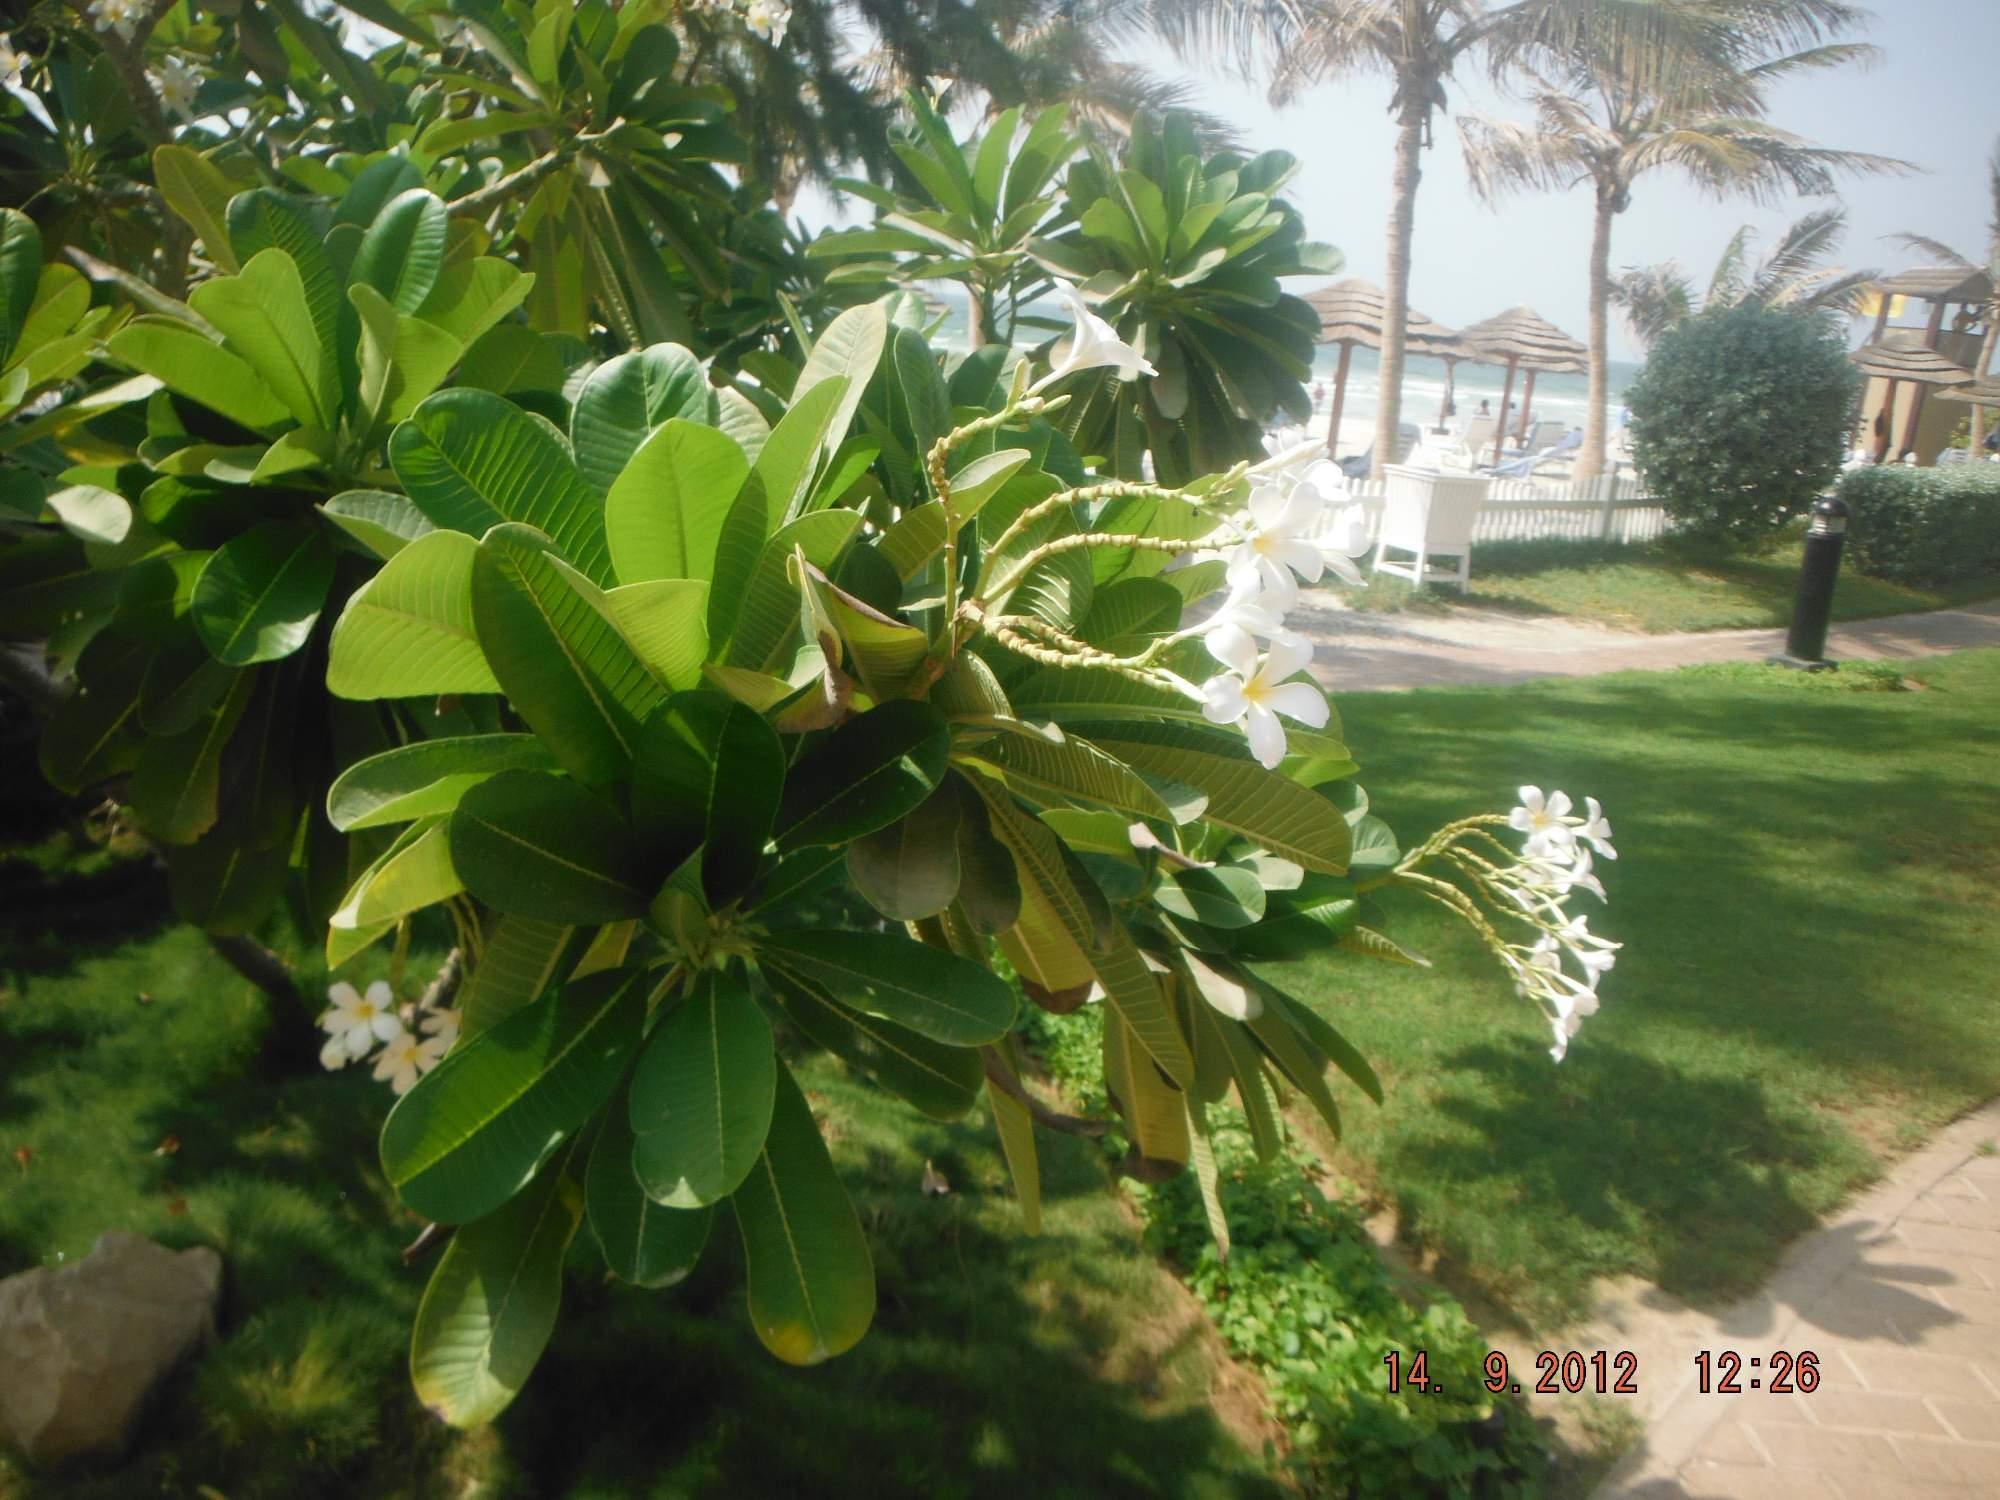 http://img24.rajce.idnes.cz/d2403/13/13214/13214242_a1e43f49e51a1daa7632f800d4edae3f/images/SAE212.jpg